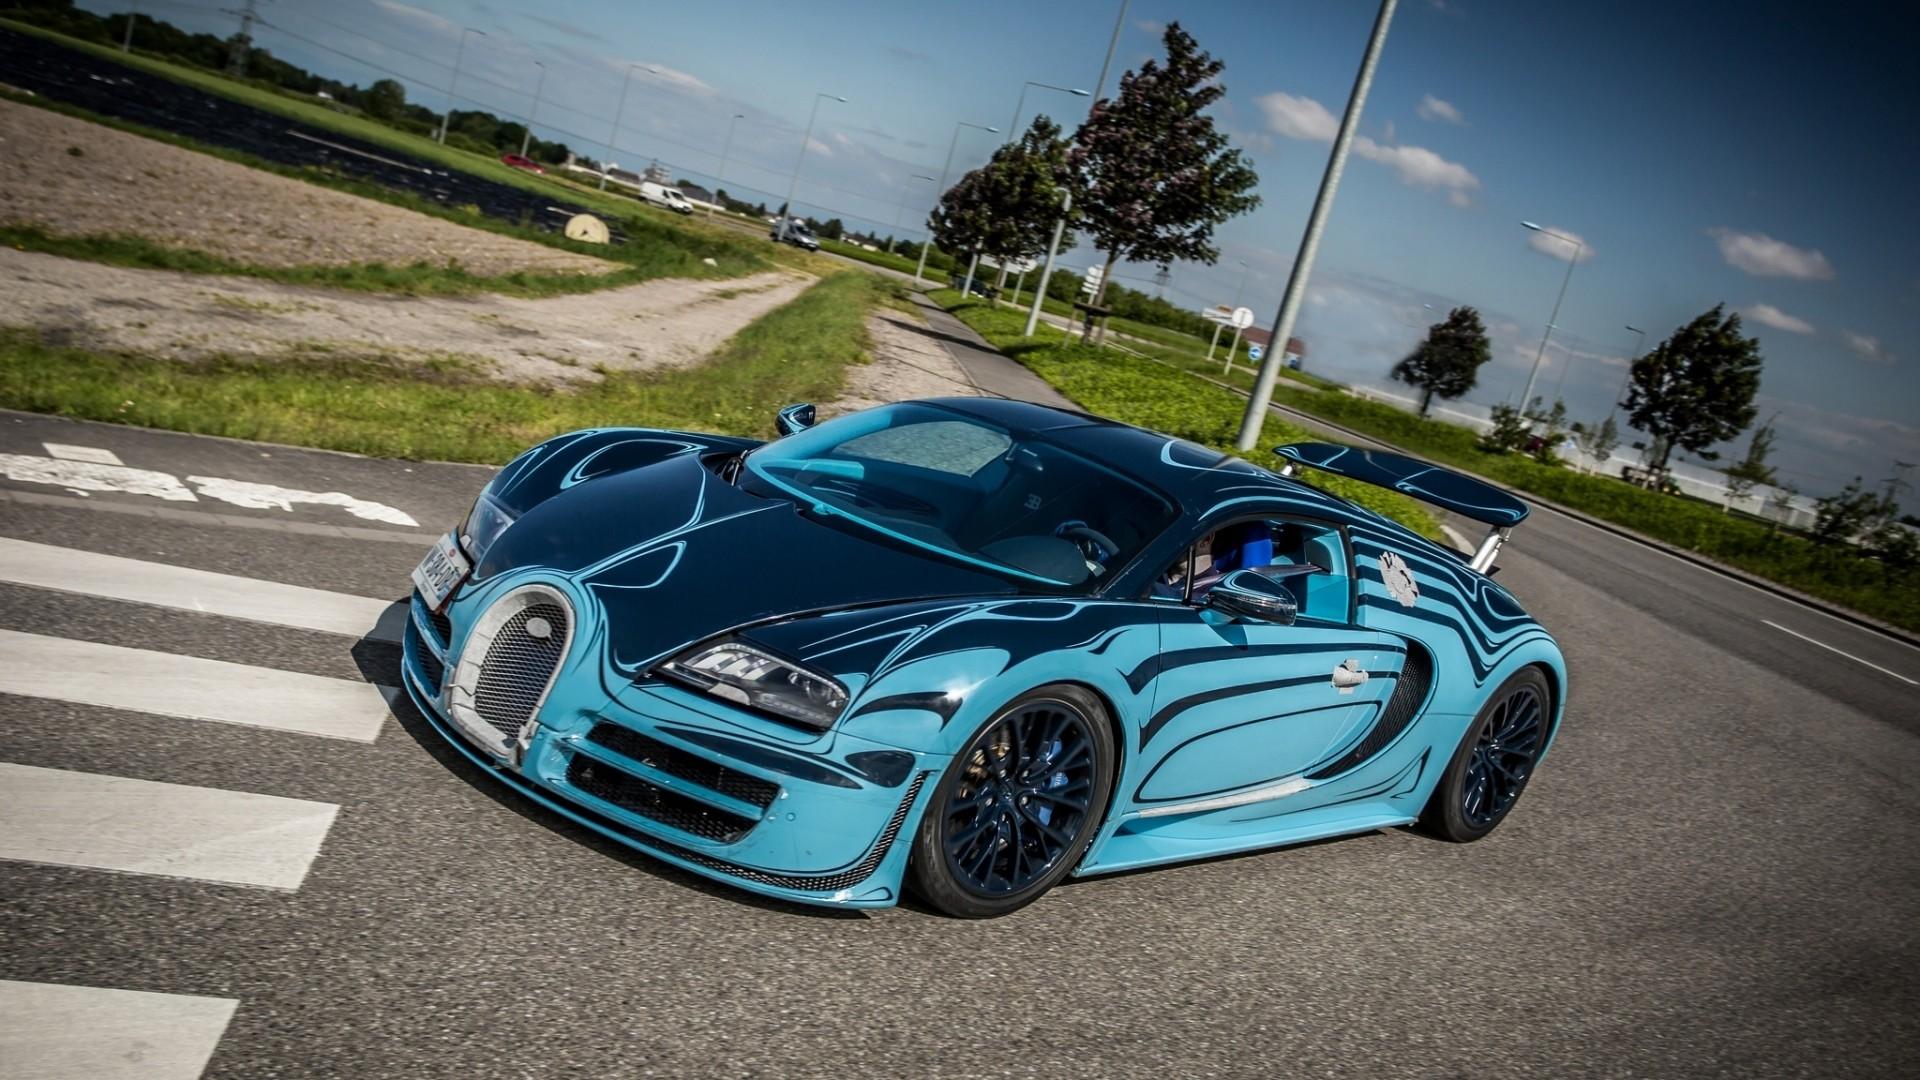 Sport Wallpaper Bugatti Veyron: Bugatti Veyron Wallpapers ·① WallpaperTag